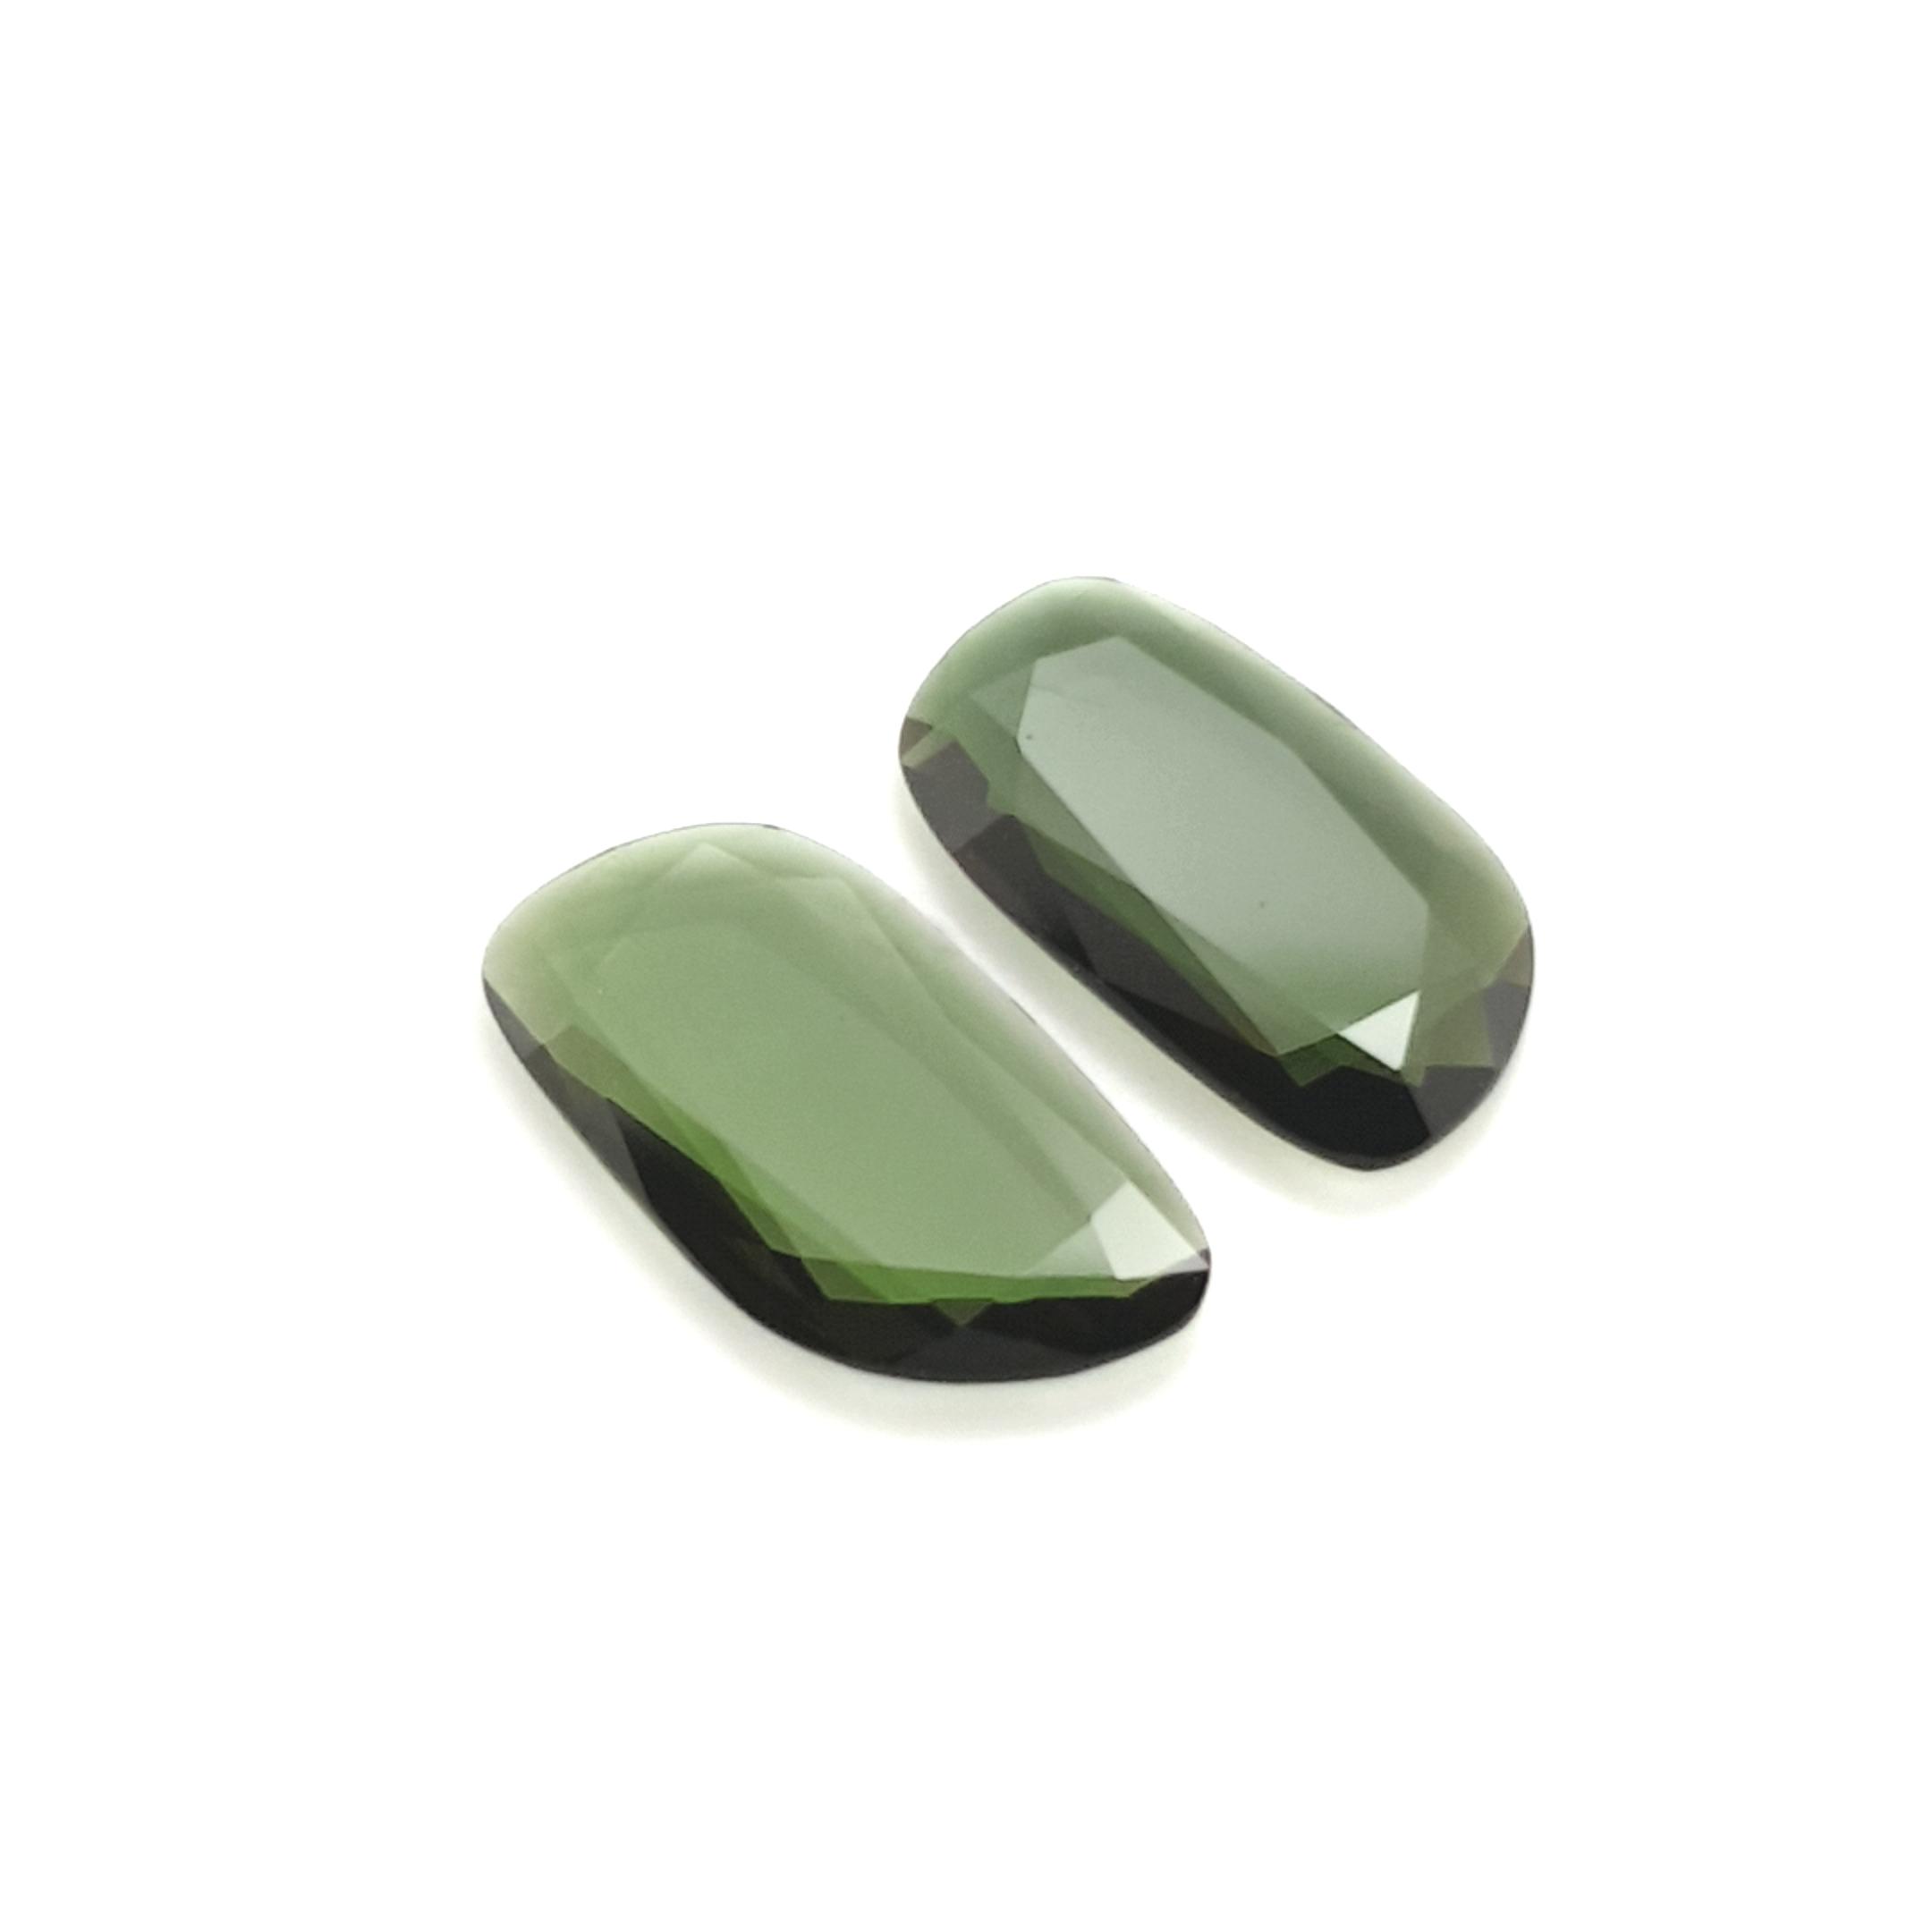 4,92ct.Pair Imperial Green Tourmalin DoubleRoseCut TMJ13C4 ClaudiaHamann__2021-02-11-20-49-17